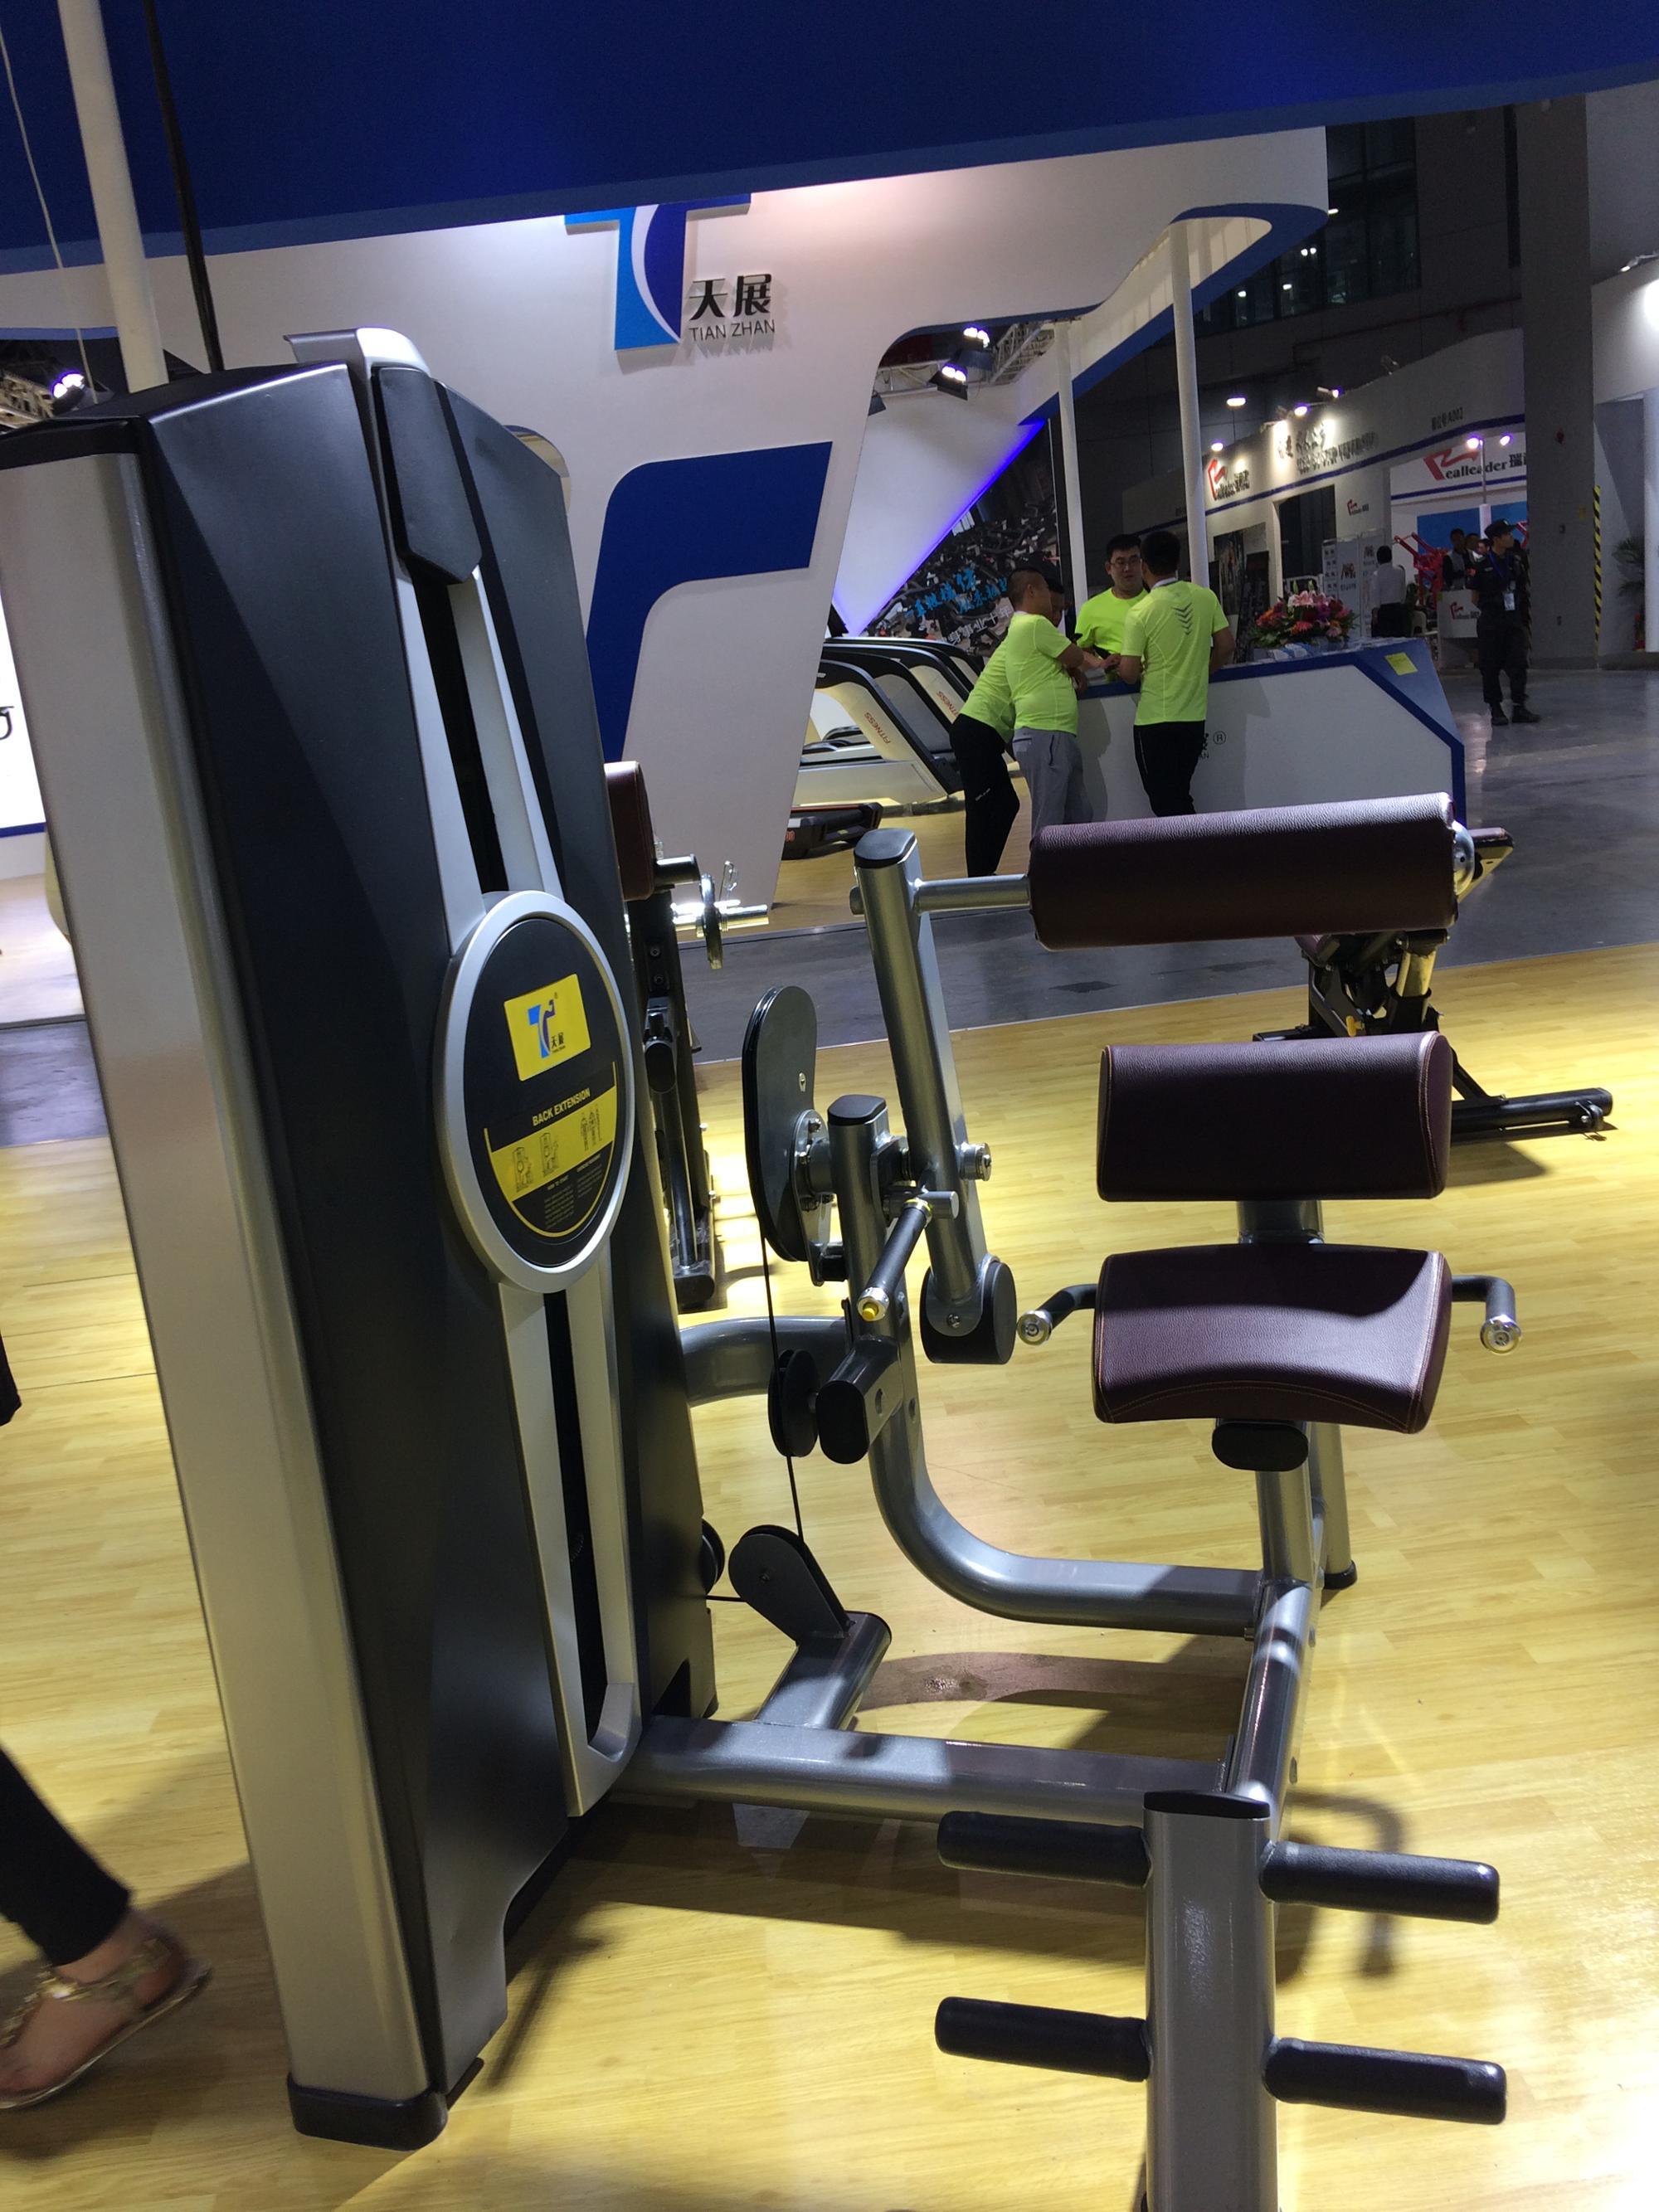 Tz-8032 Luxury Commercial Fitness Equipment Gym Equipment ...